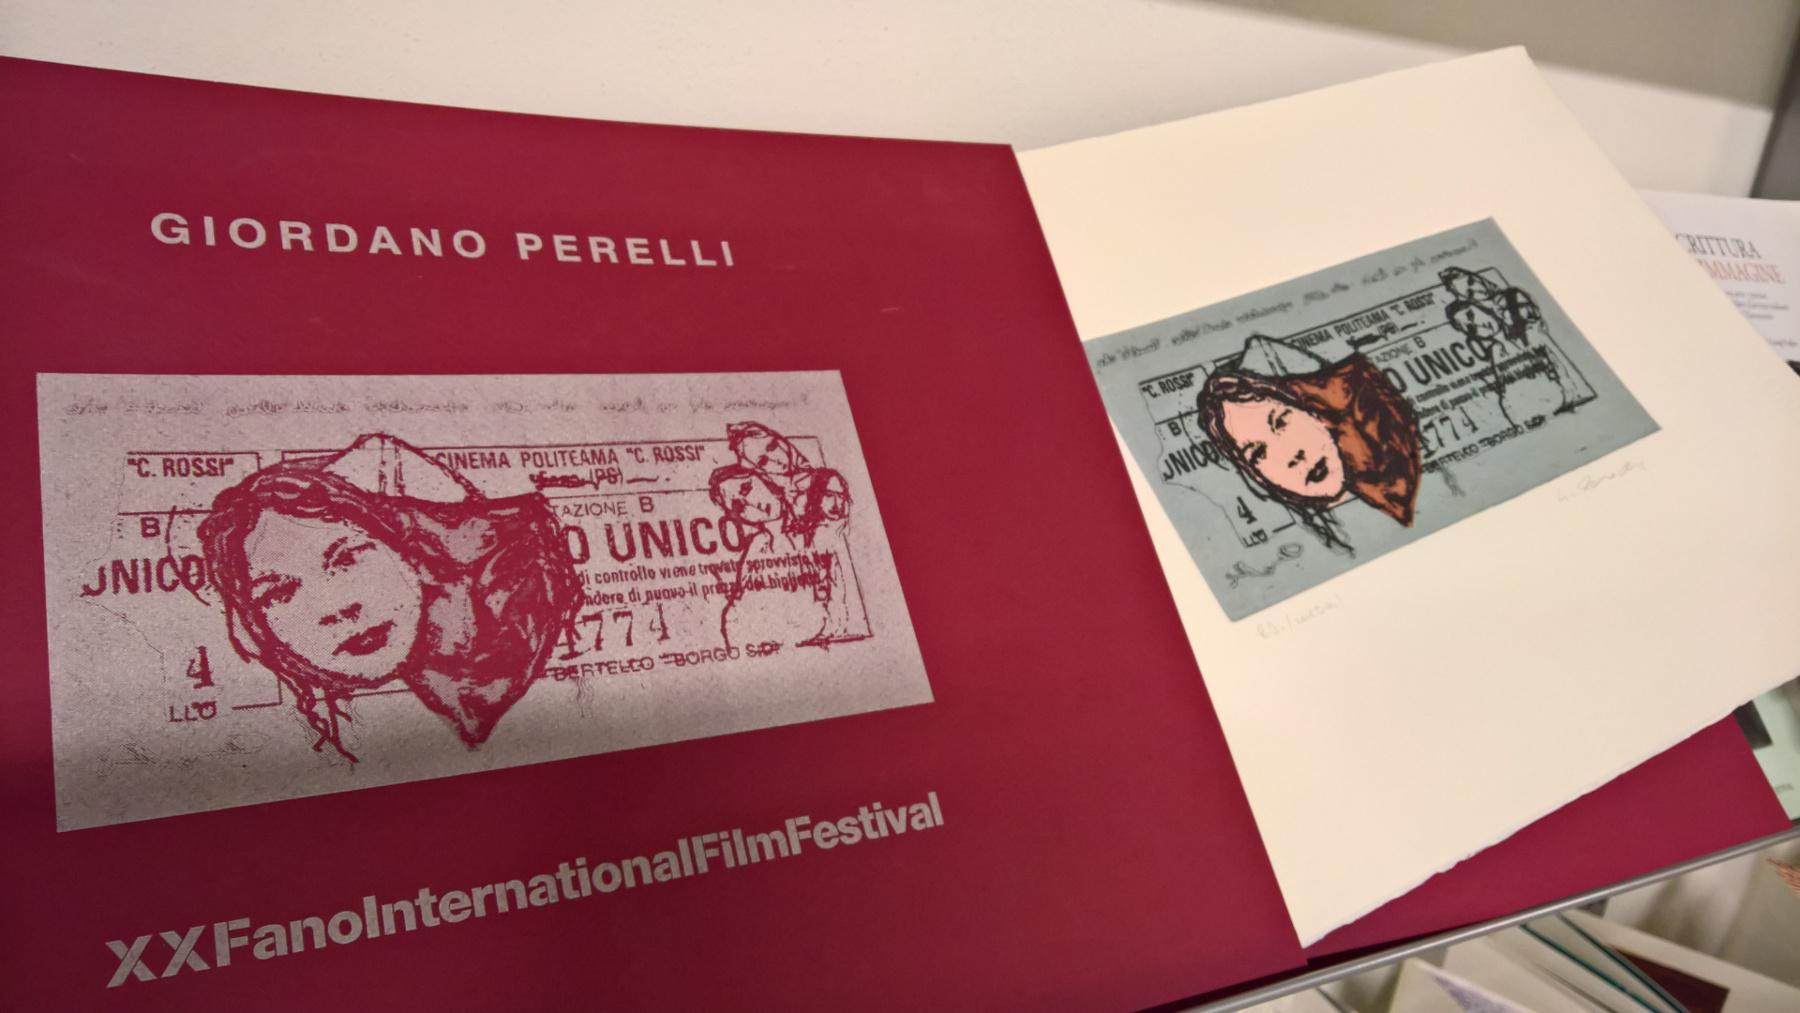 Perelli Fanointernationalfilmfestival